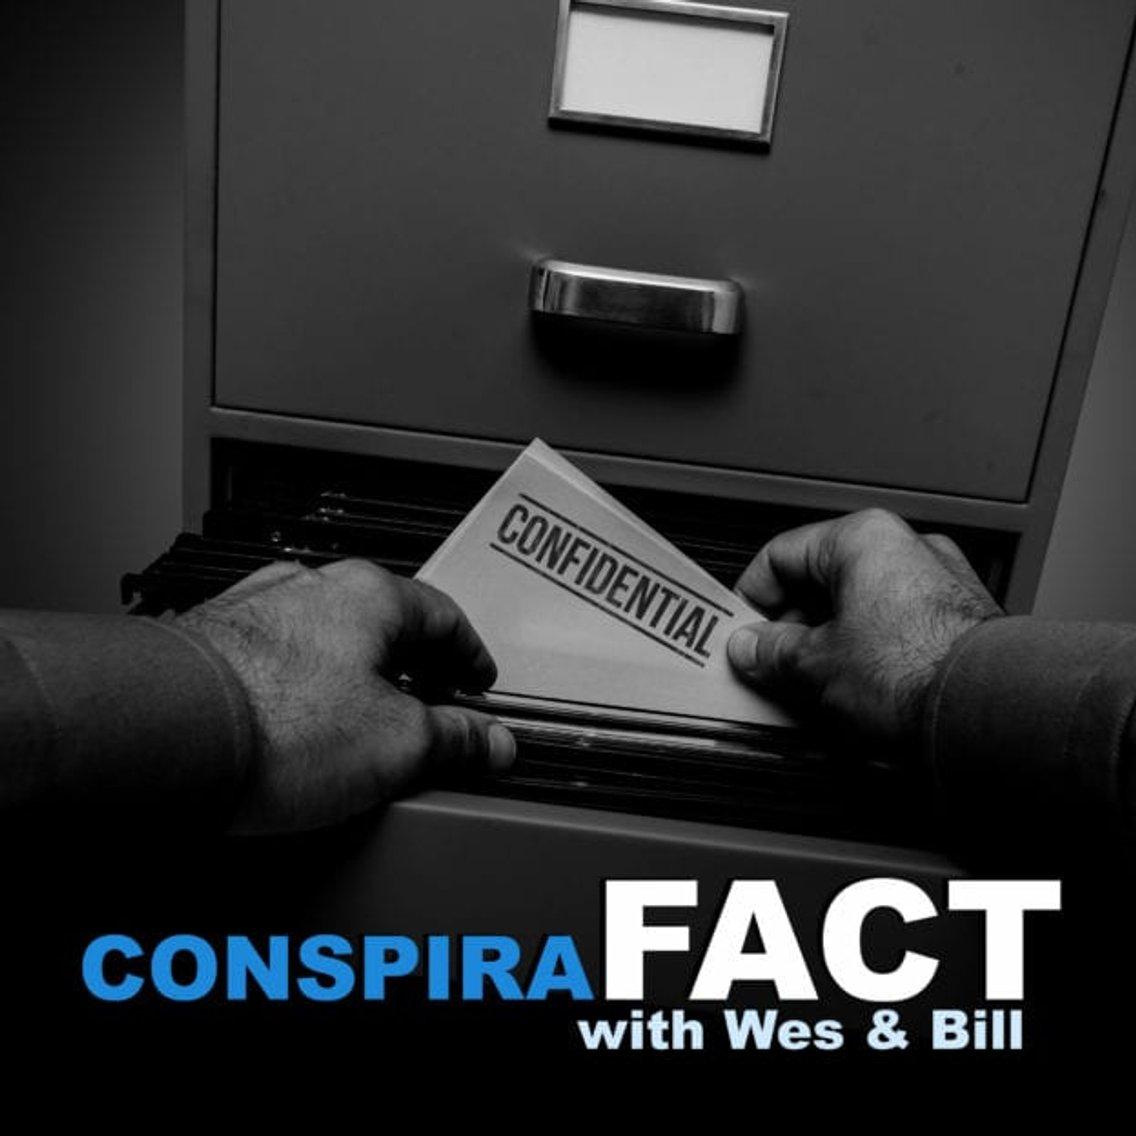 ConspiraFACT - Cover Image